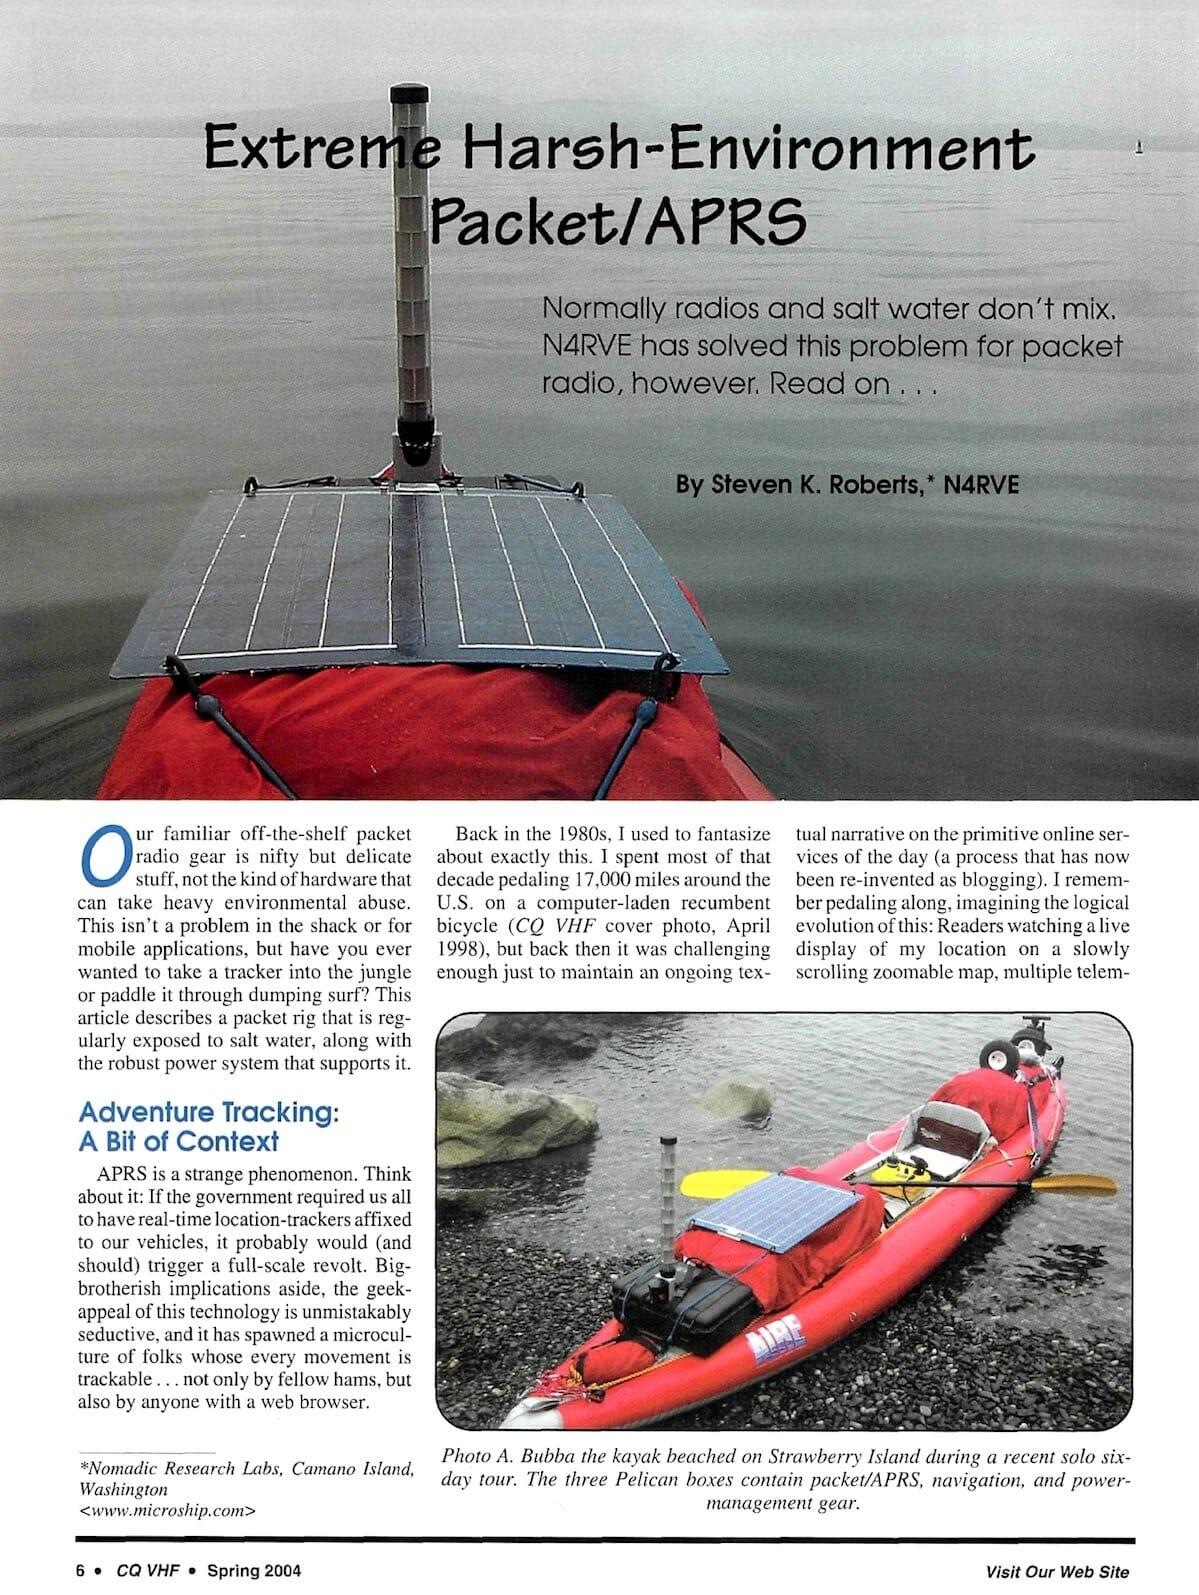 Extreme Harsh Environment Packet Aprs In Kayak Cq Vhf Nomadic Pelican Pedal Boat Wiring Diagram Back